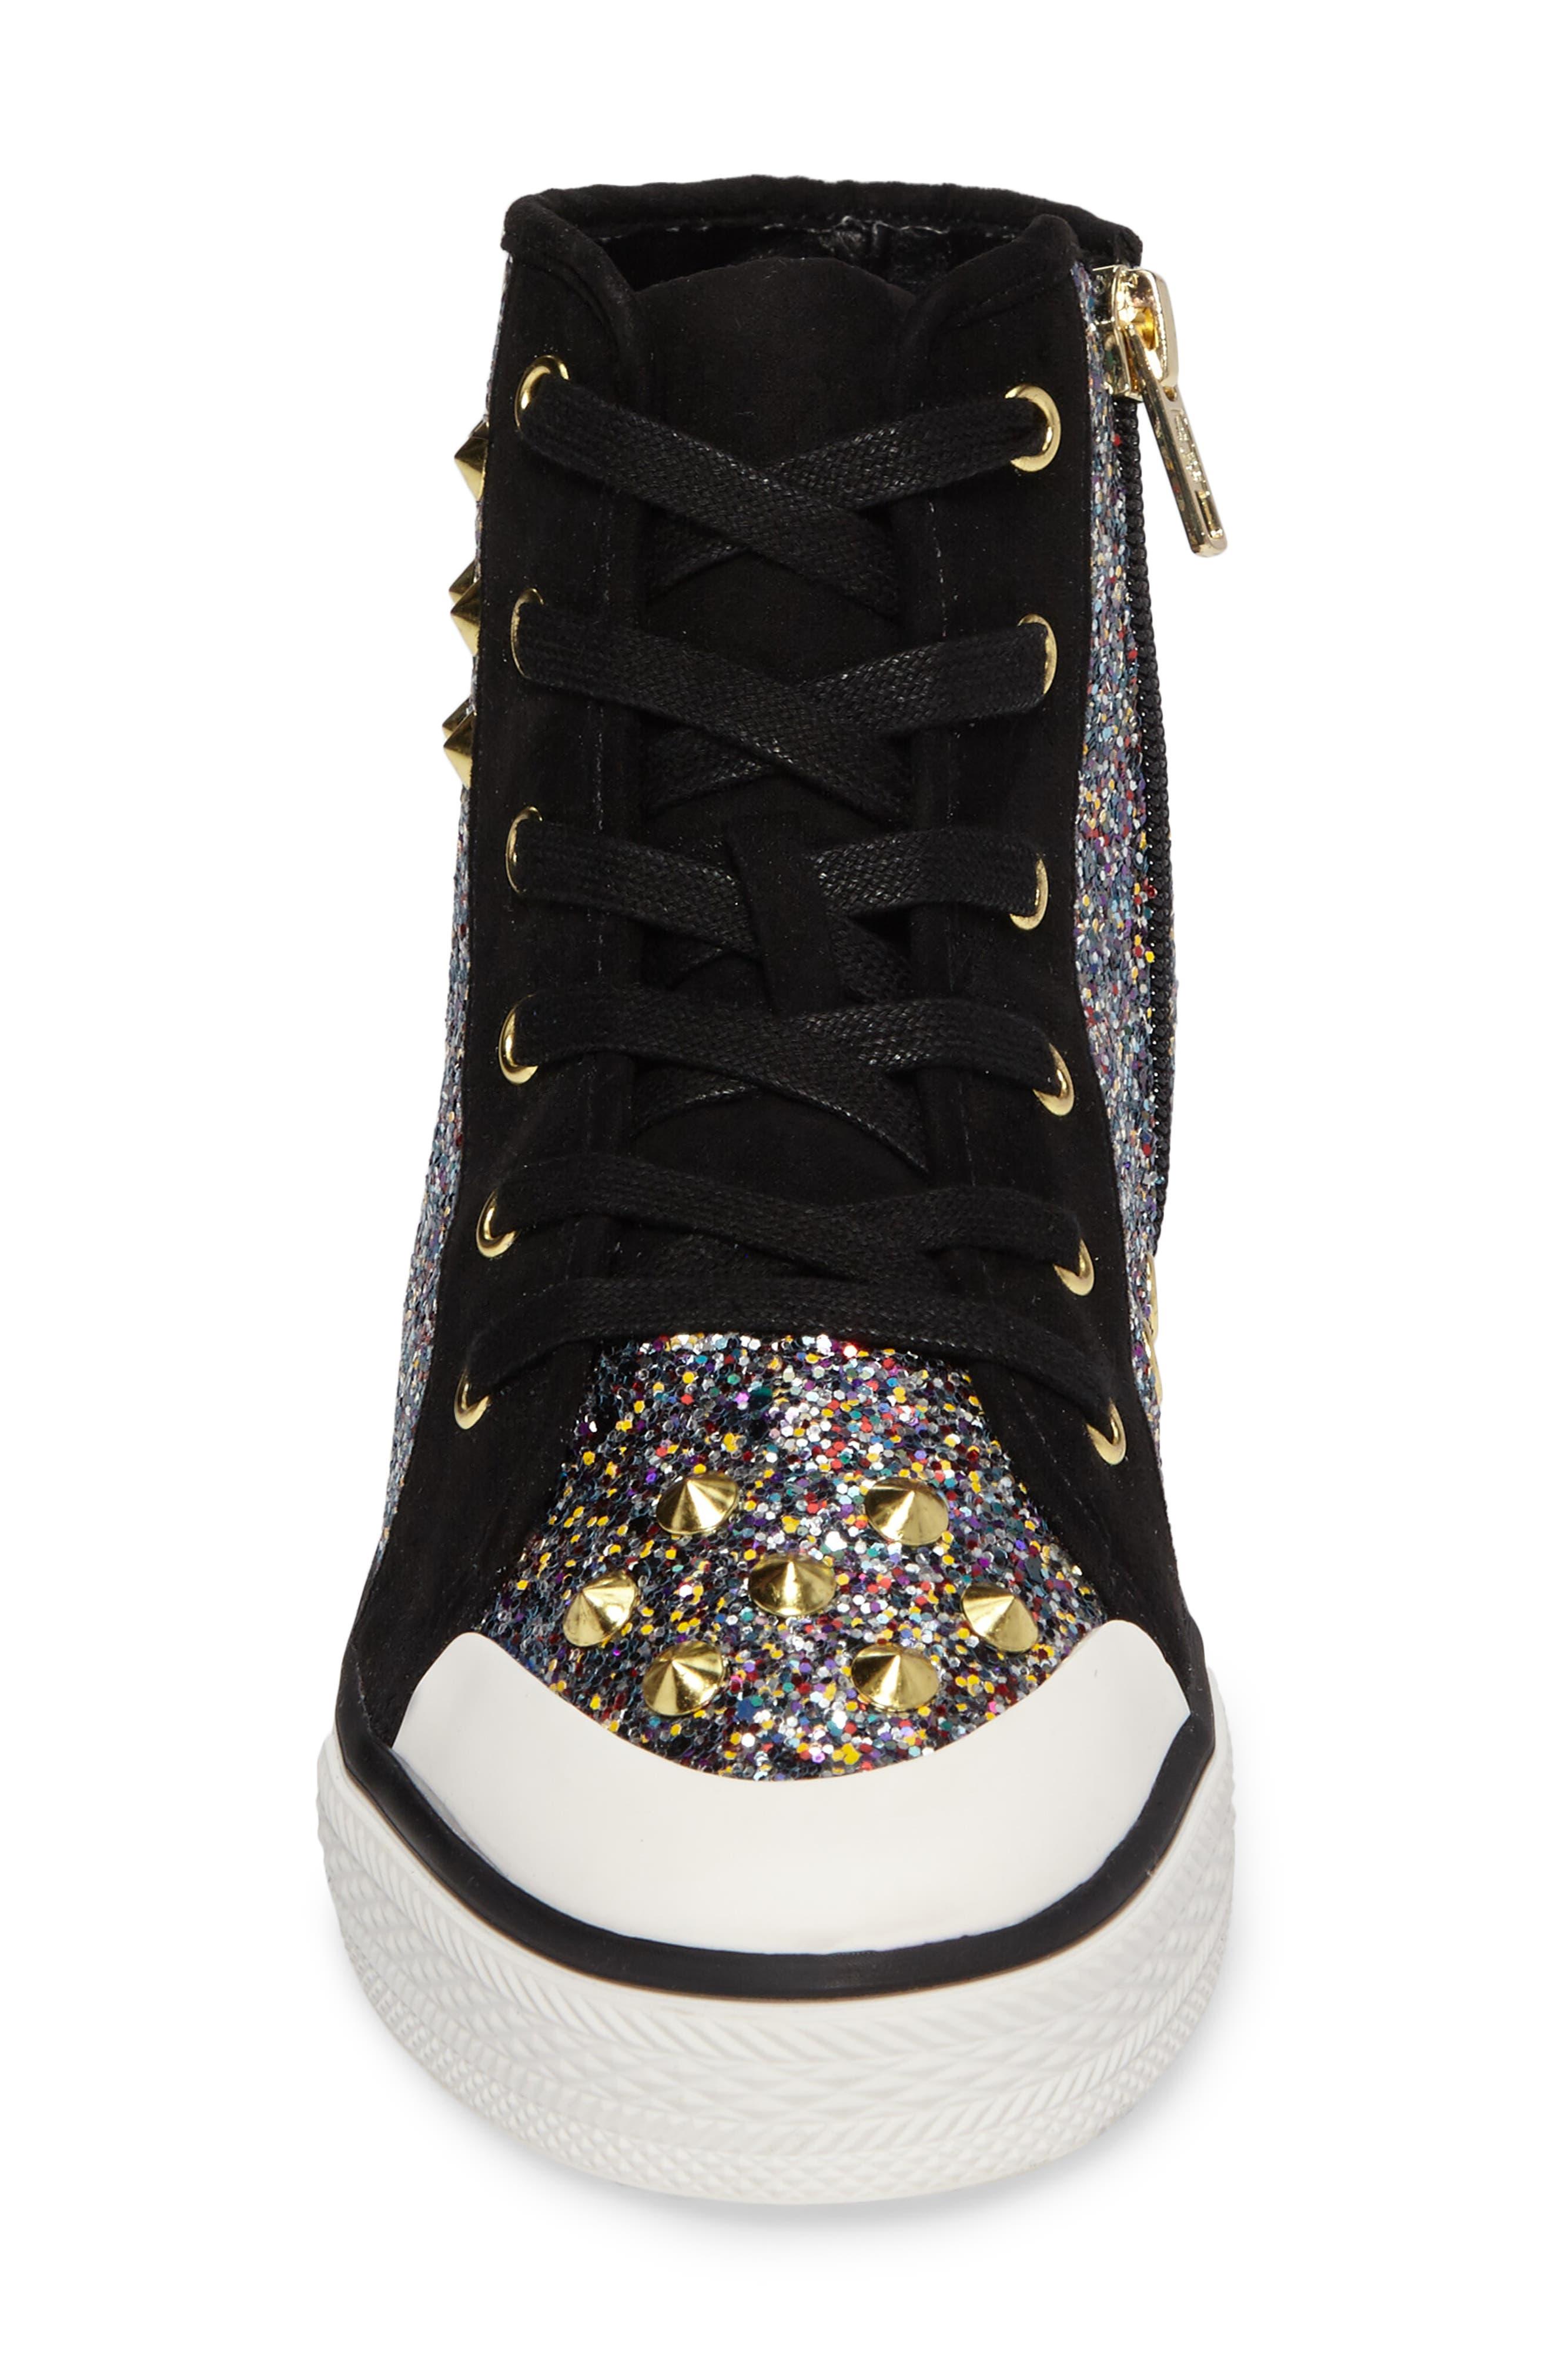 Lita Roe Glittery High Top Sneaker,                             Alternate thumbnail 4, color,                             003